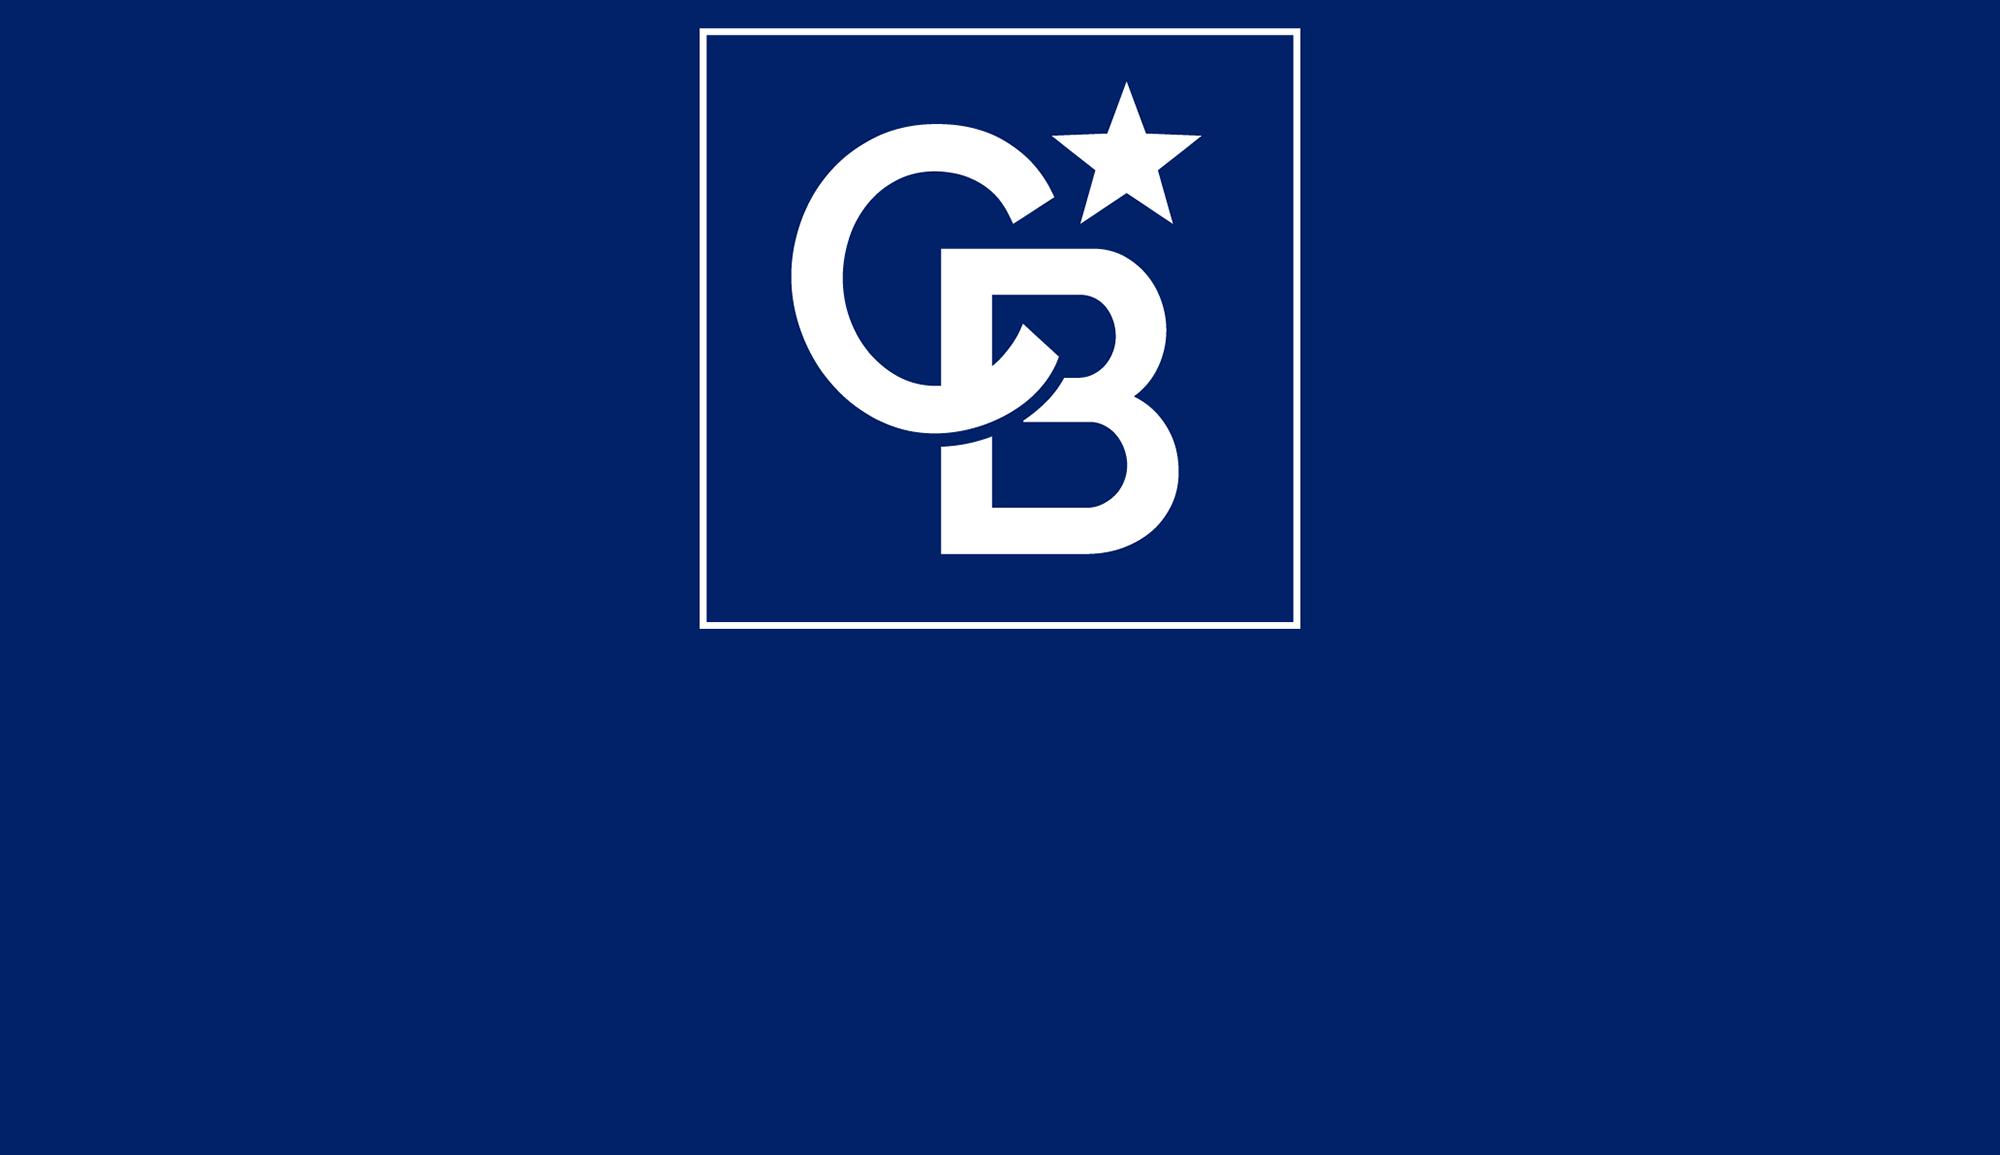 Luray Jordan - Coldwell Banker Triad Logo